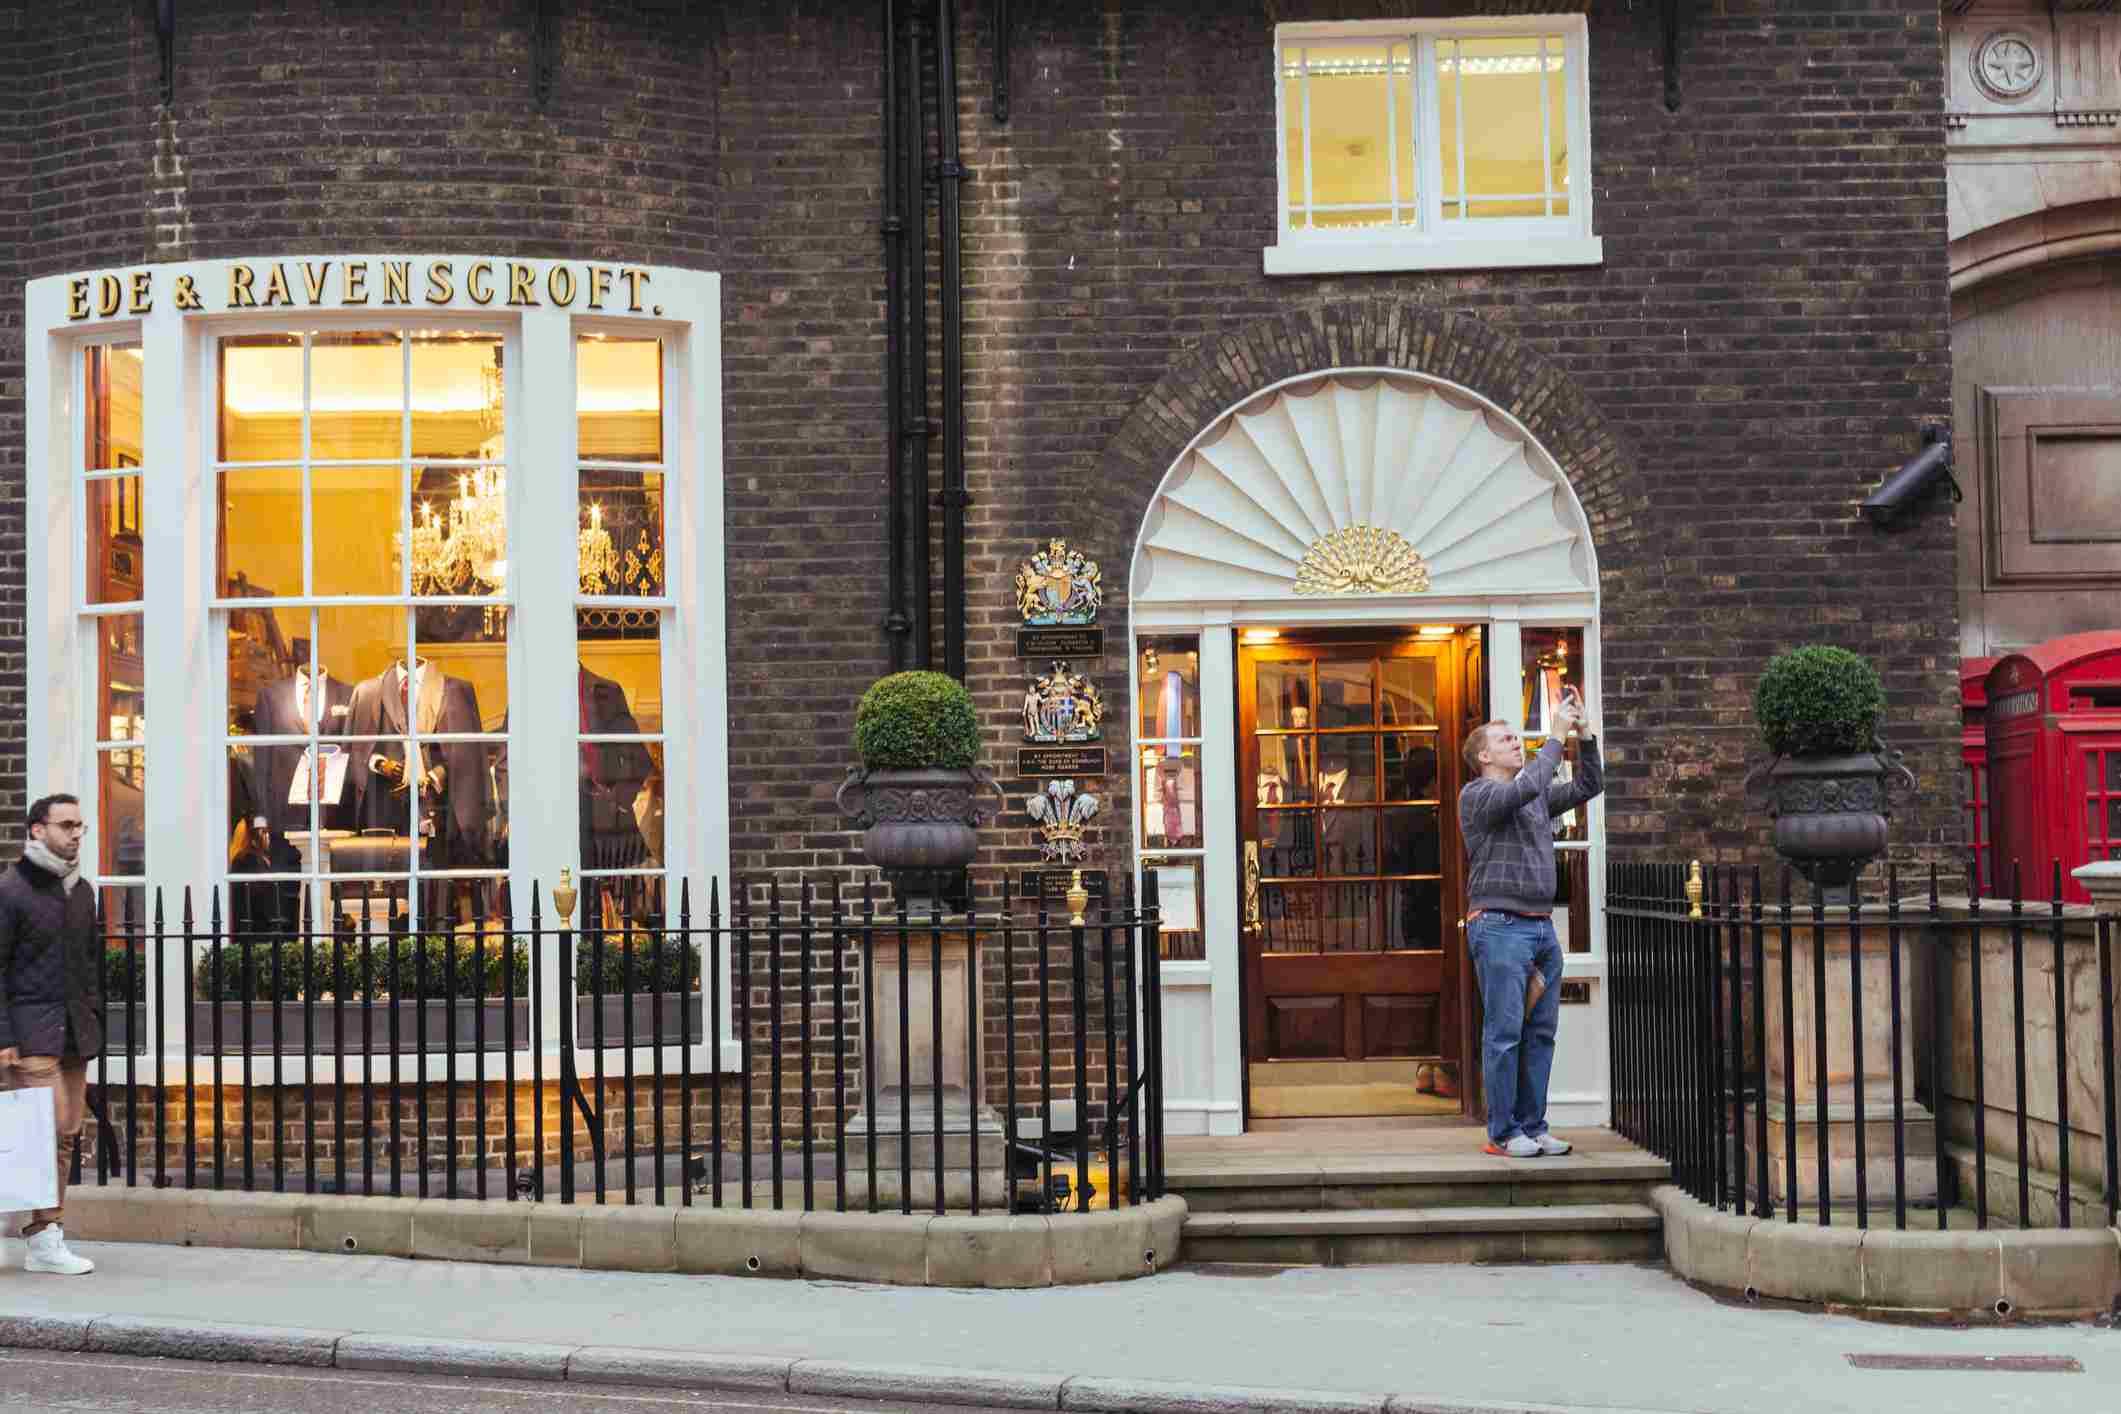 Ede & Ravenscroft tailors shop on Savile Row, Mayfair London